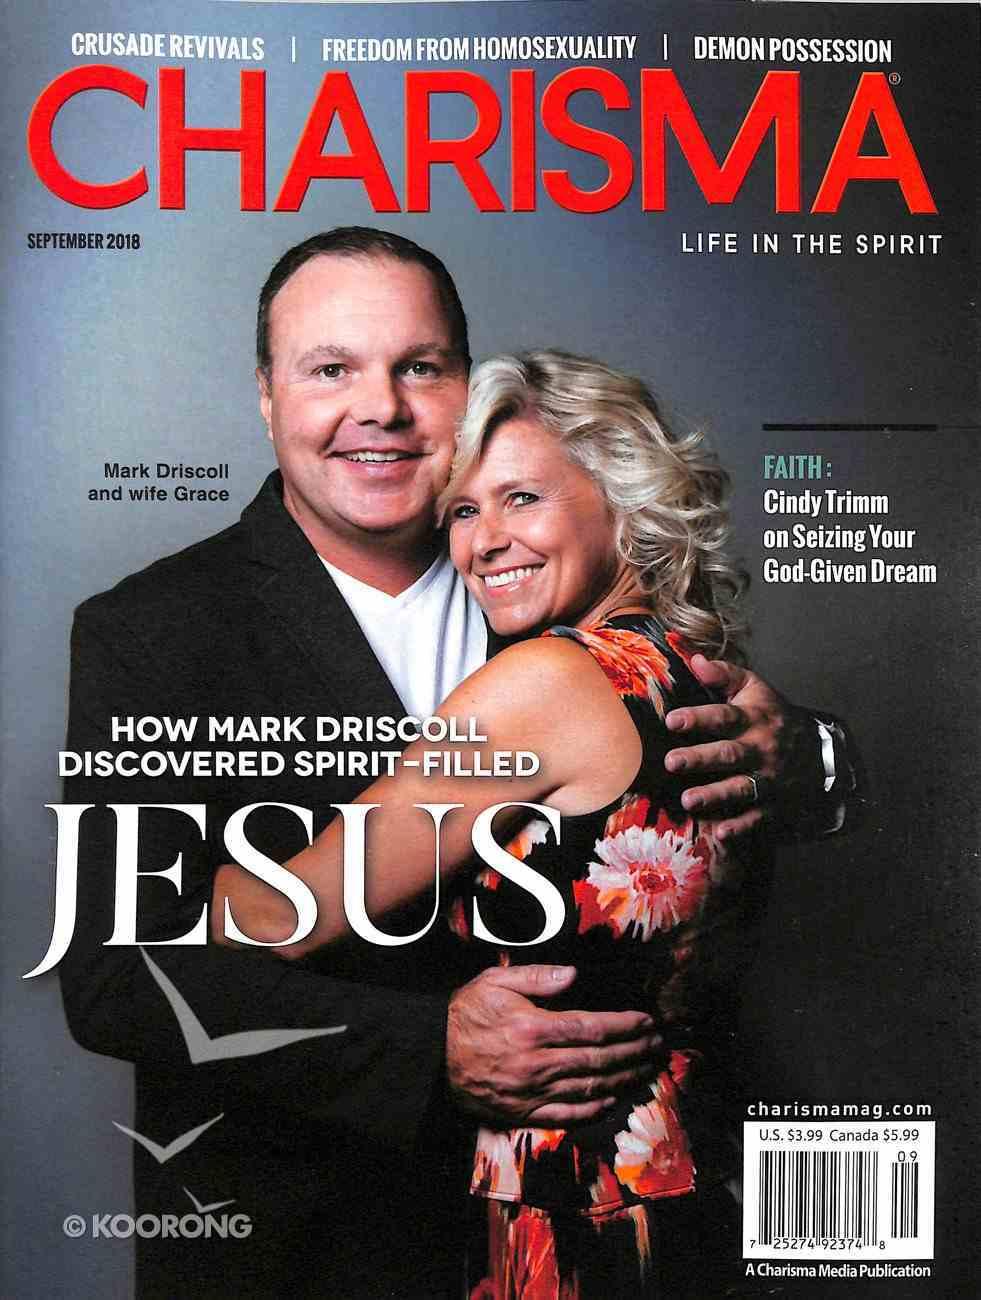 Charisma Magazine 2018 #09: Sep Magazine